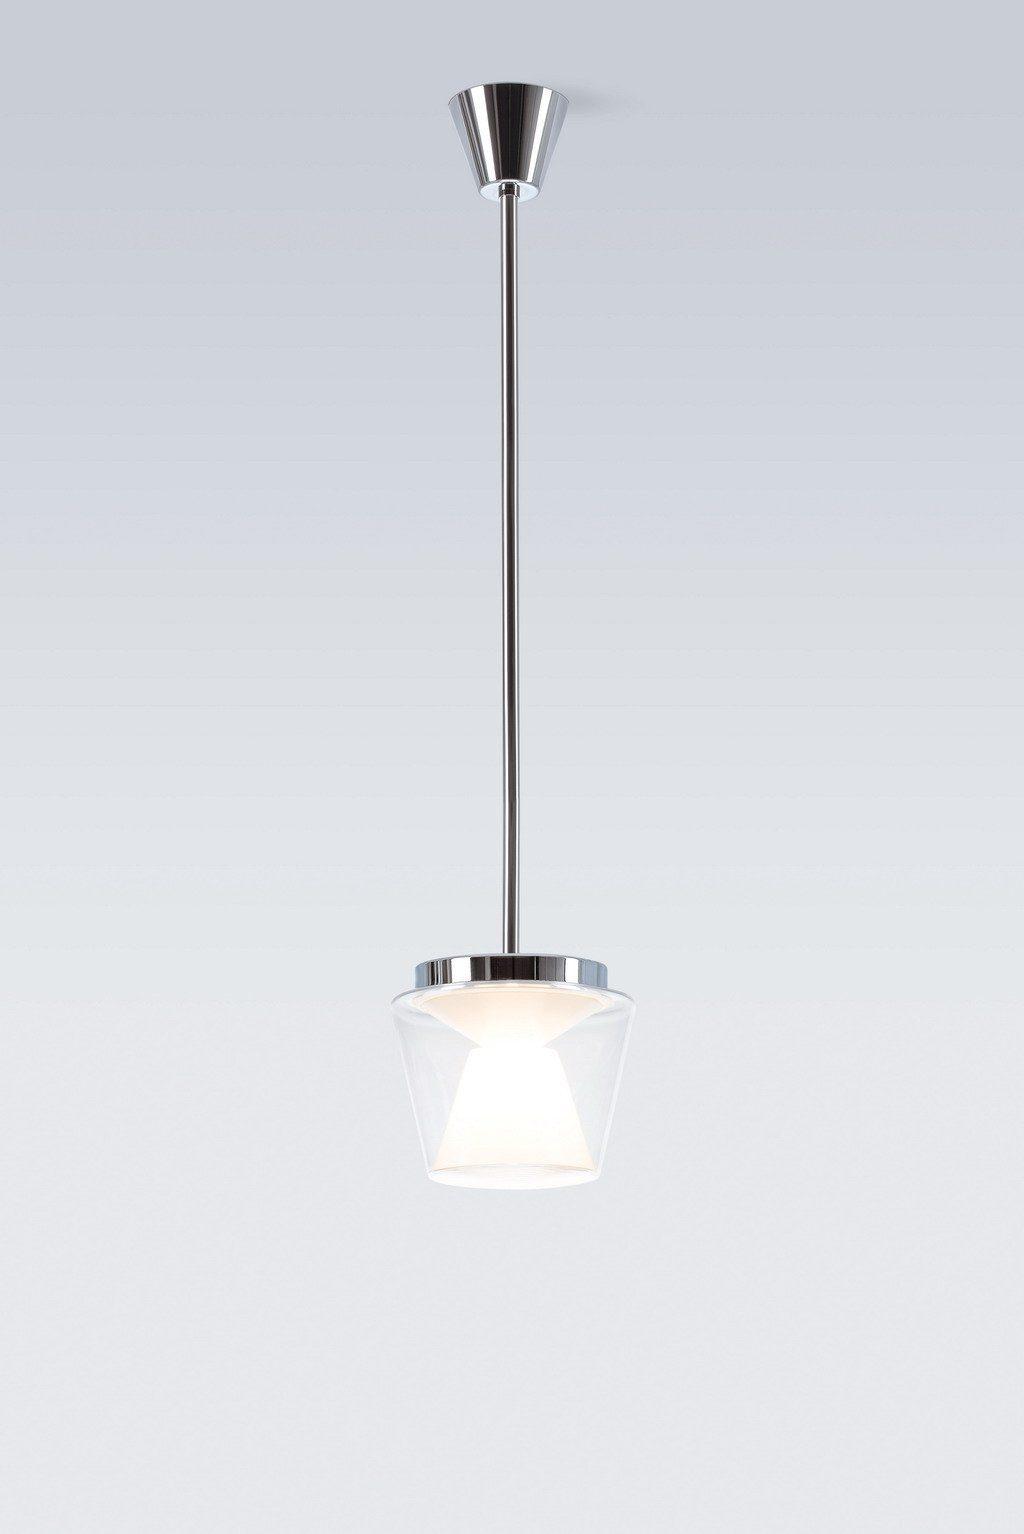 Serien Lighting Pendelleuchte Annex LED Suspension Acrylglas - Pendelleuchten Innen